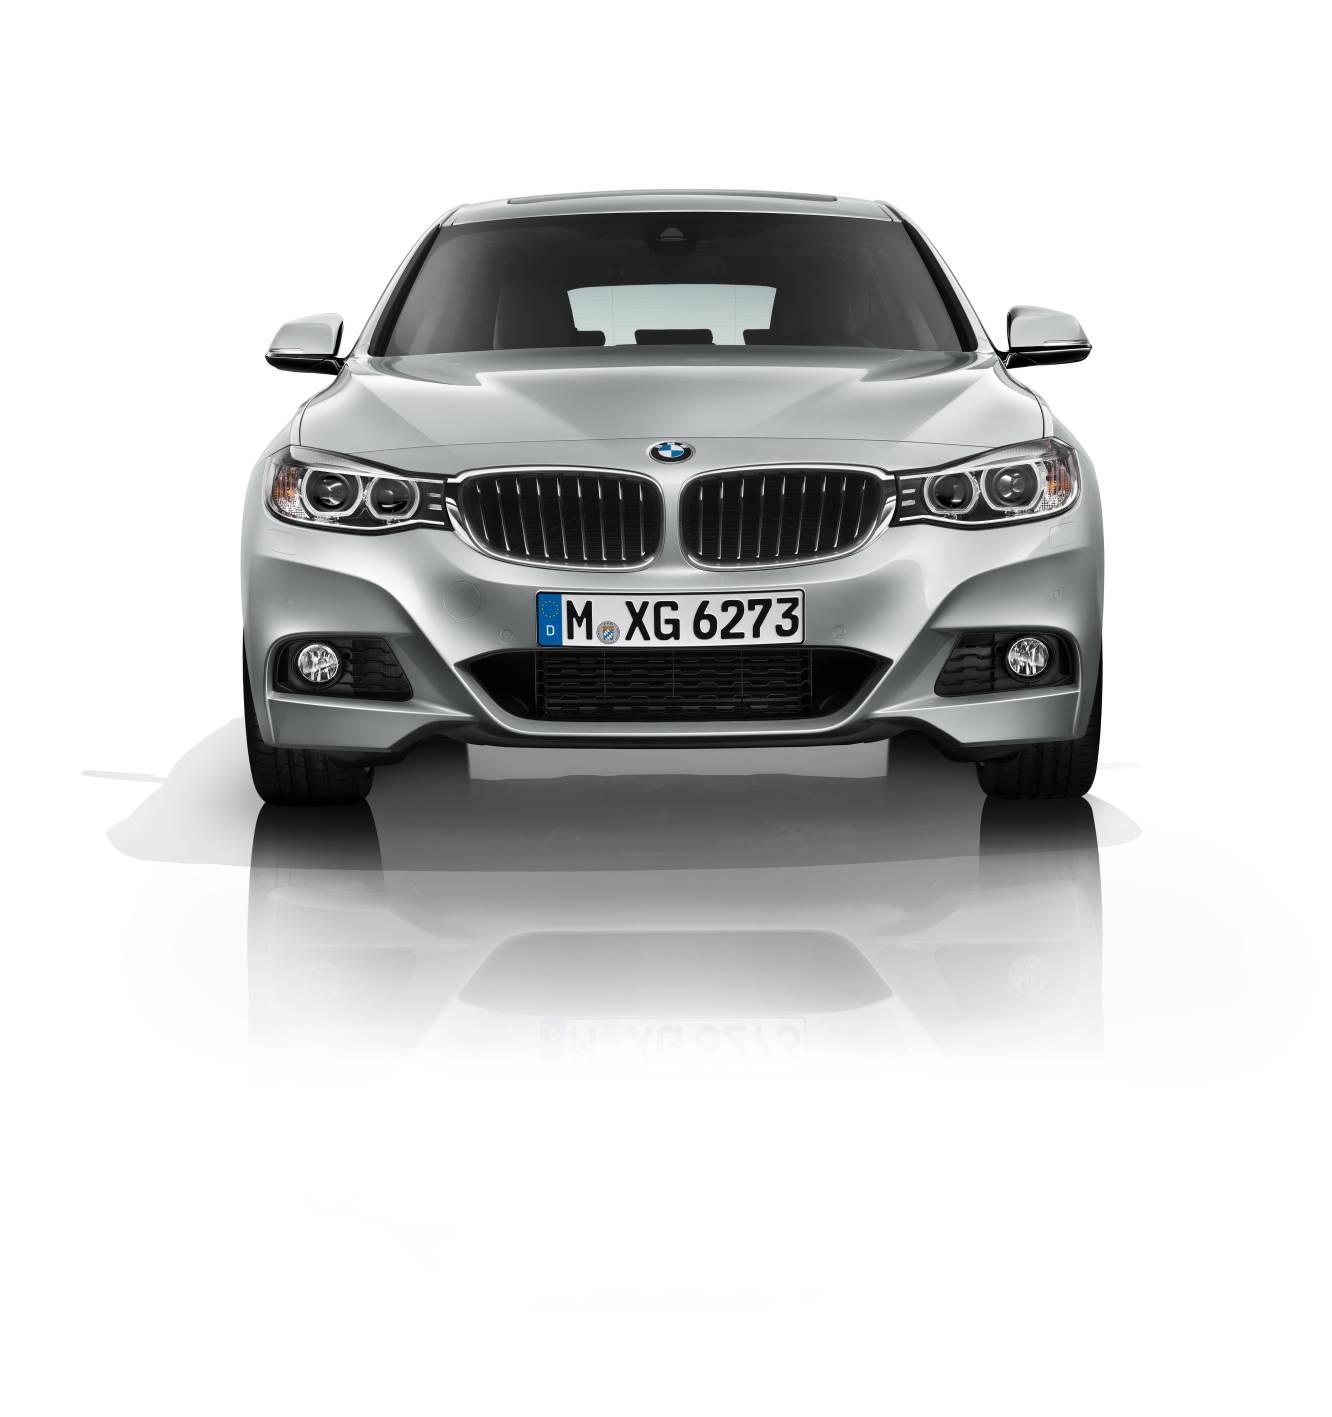 Bmwcar Price: News: 3-Series Gran Turismo Pricing And